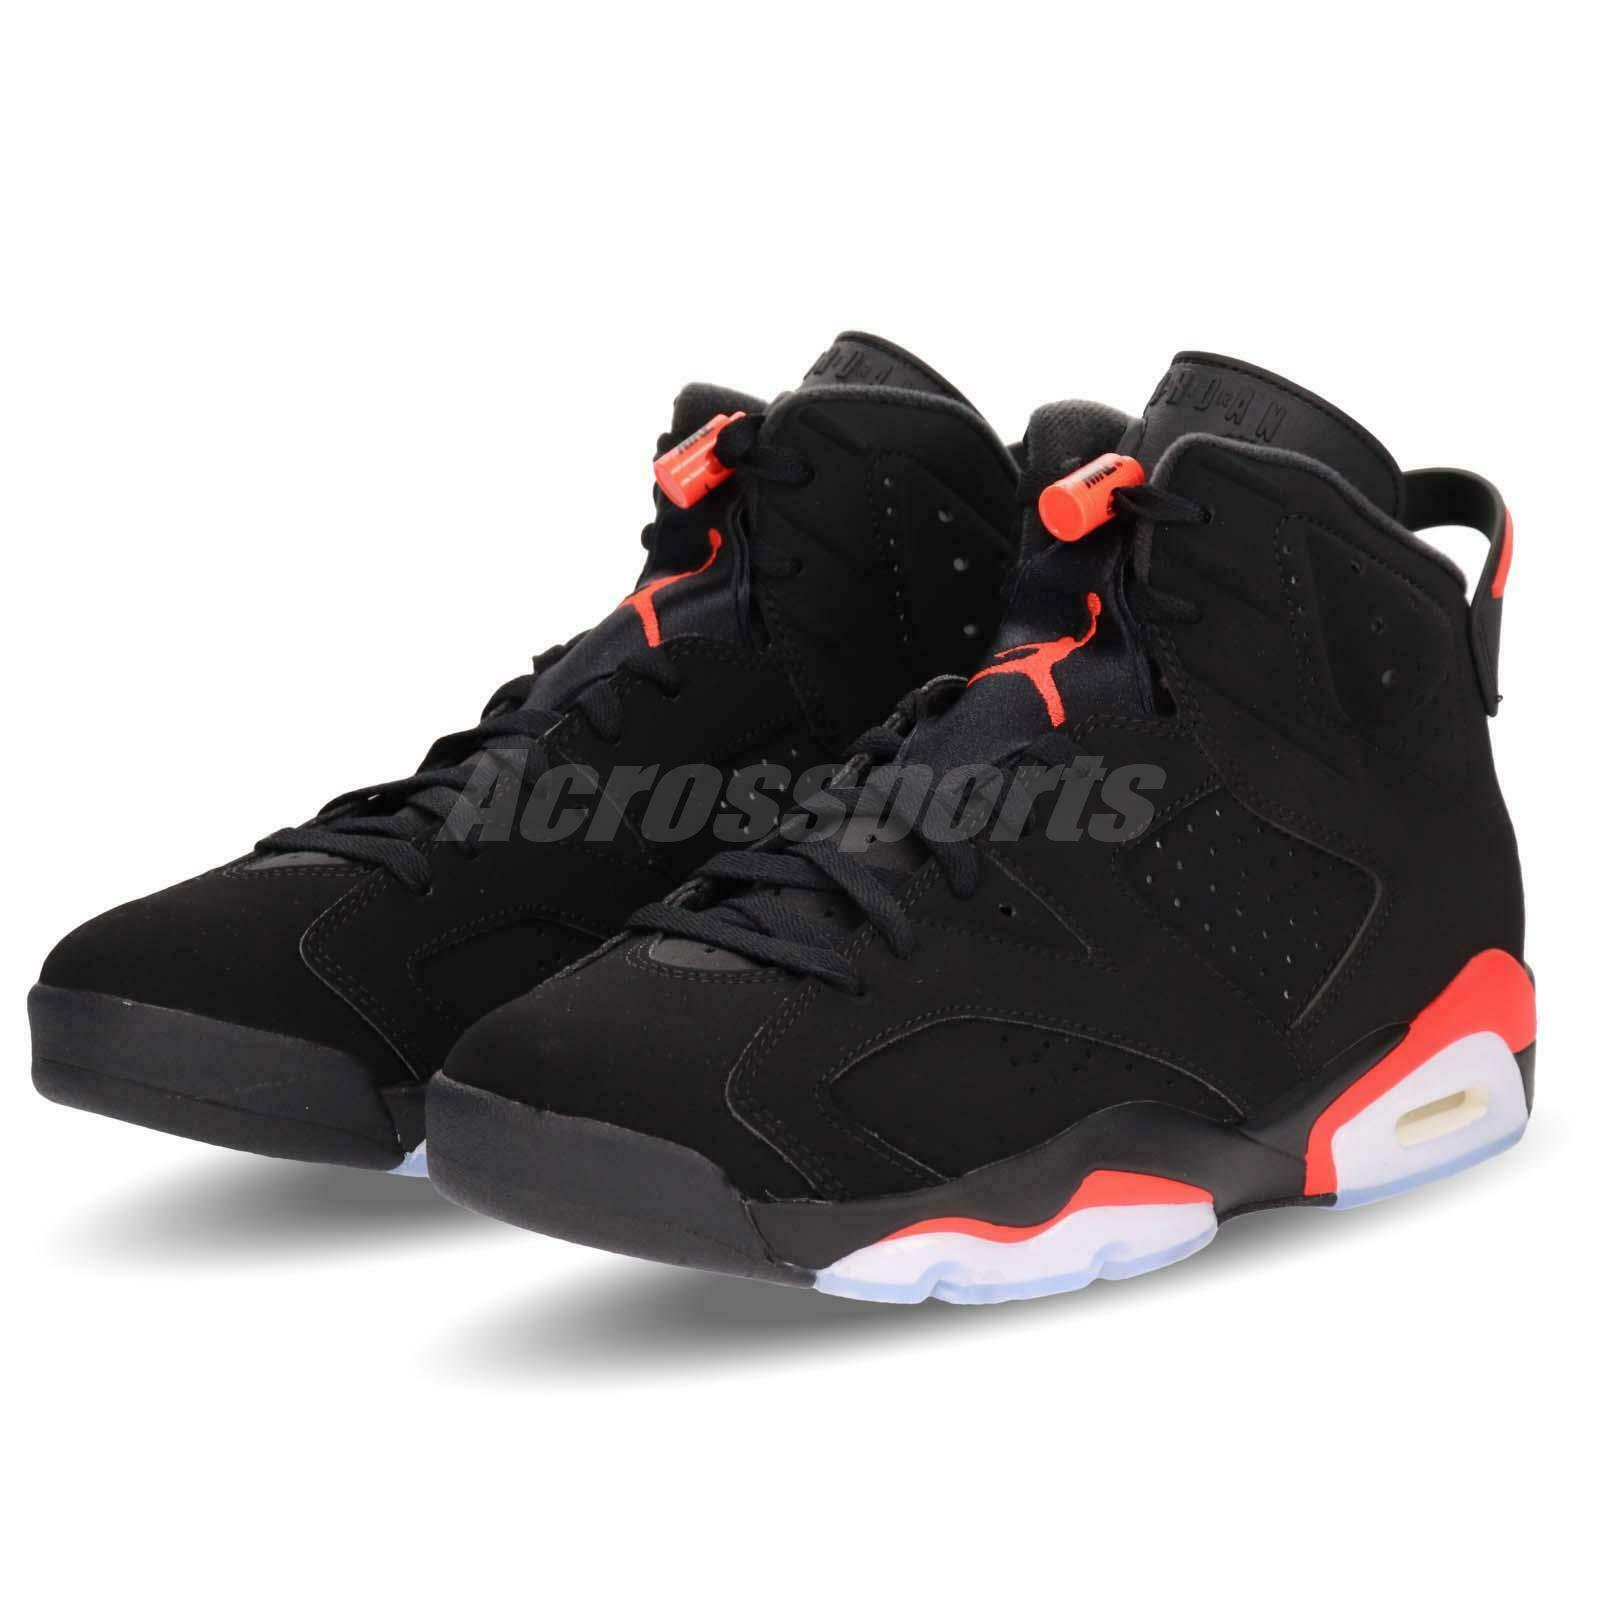 Nike Air Jordan 6 Retro Retro Retro Infrarosso nero OG 2019 VI Preorder Men donna Kids Pick 1   Sale Italia    Scolaro/Signora Scarpa  31979c